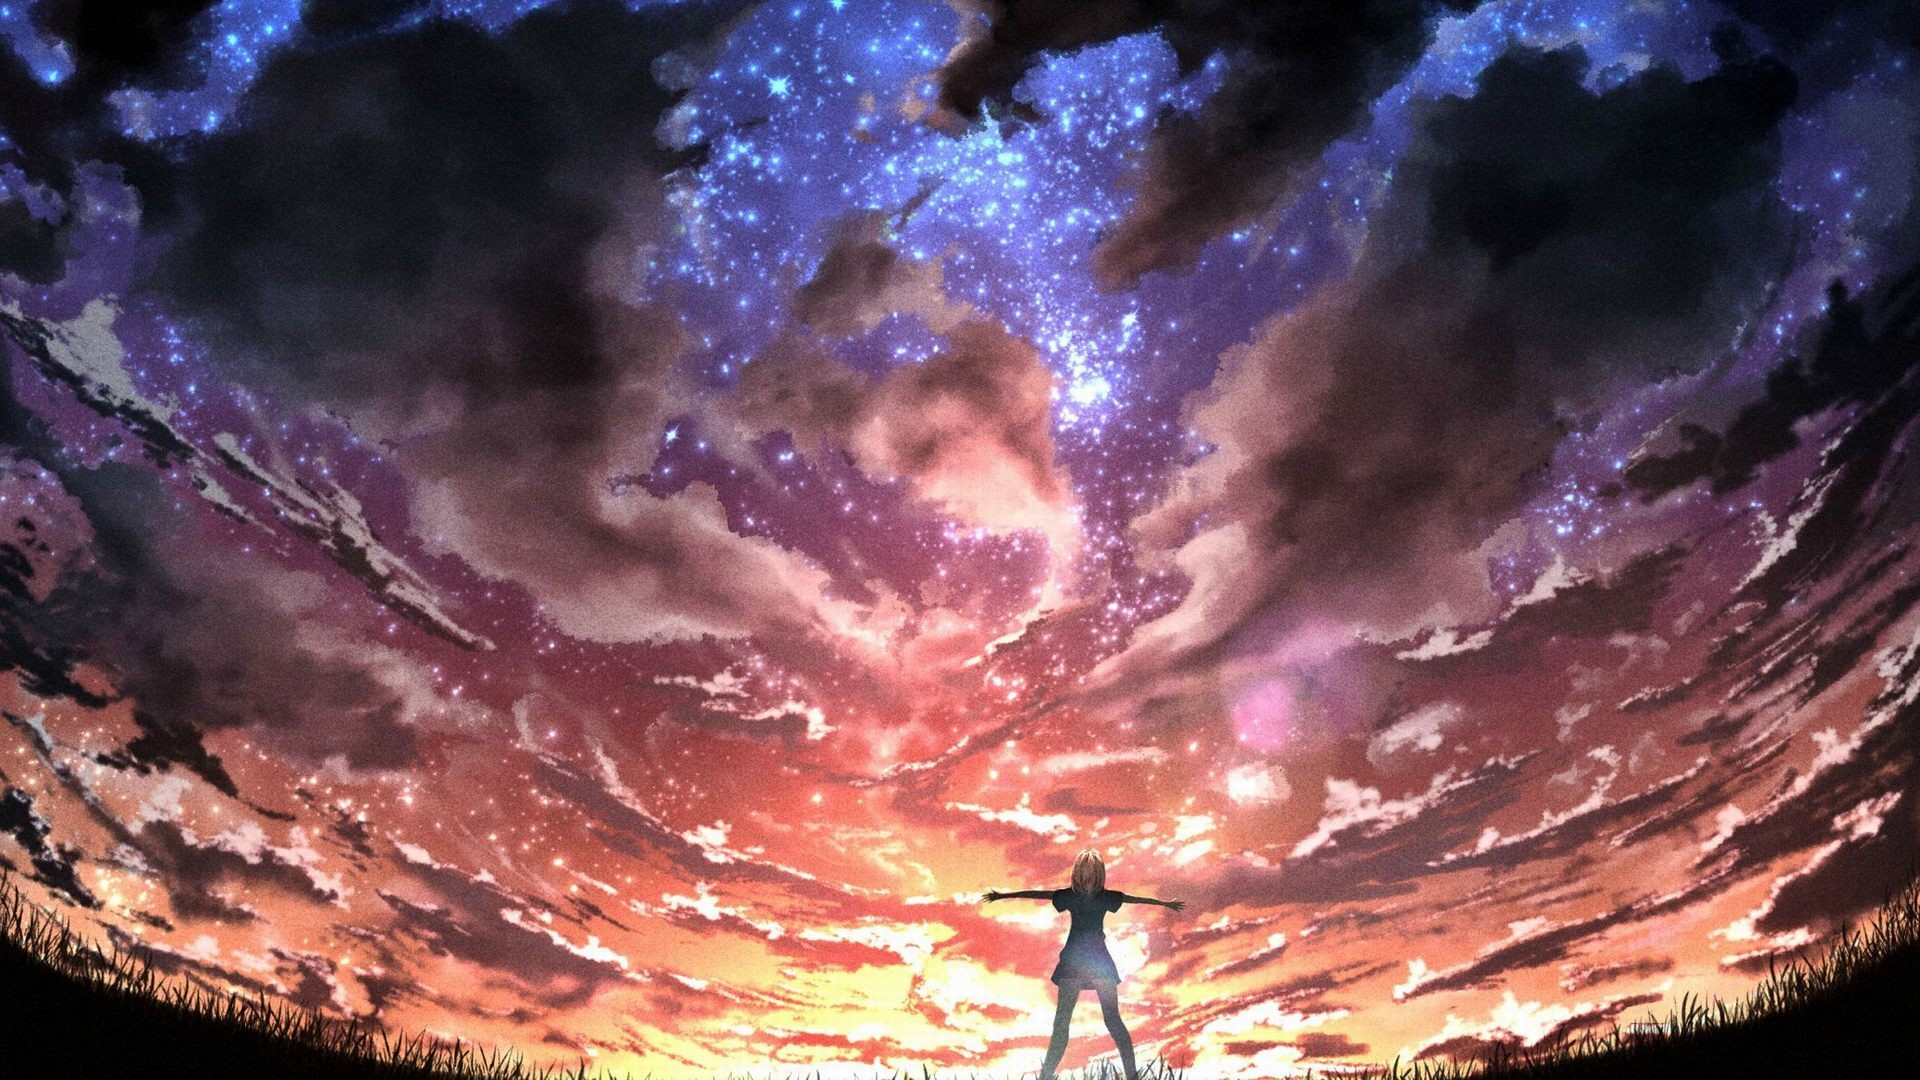 … Anime Wallpaper, 35 High Quality Anime Wallpapers Full HD Anime .